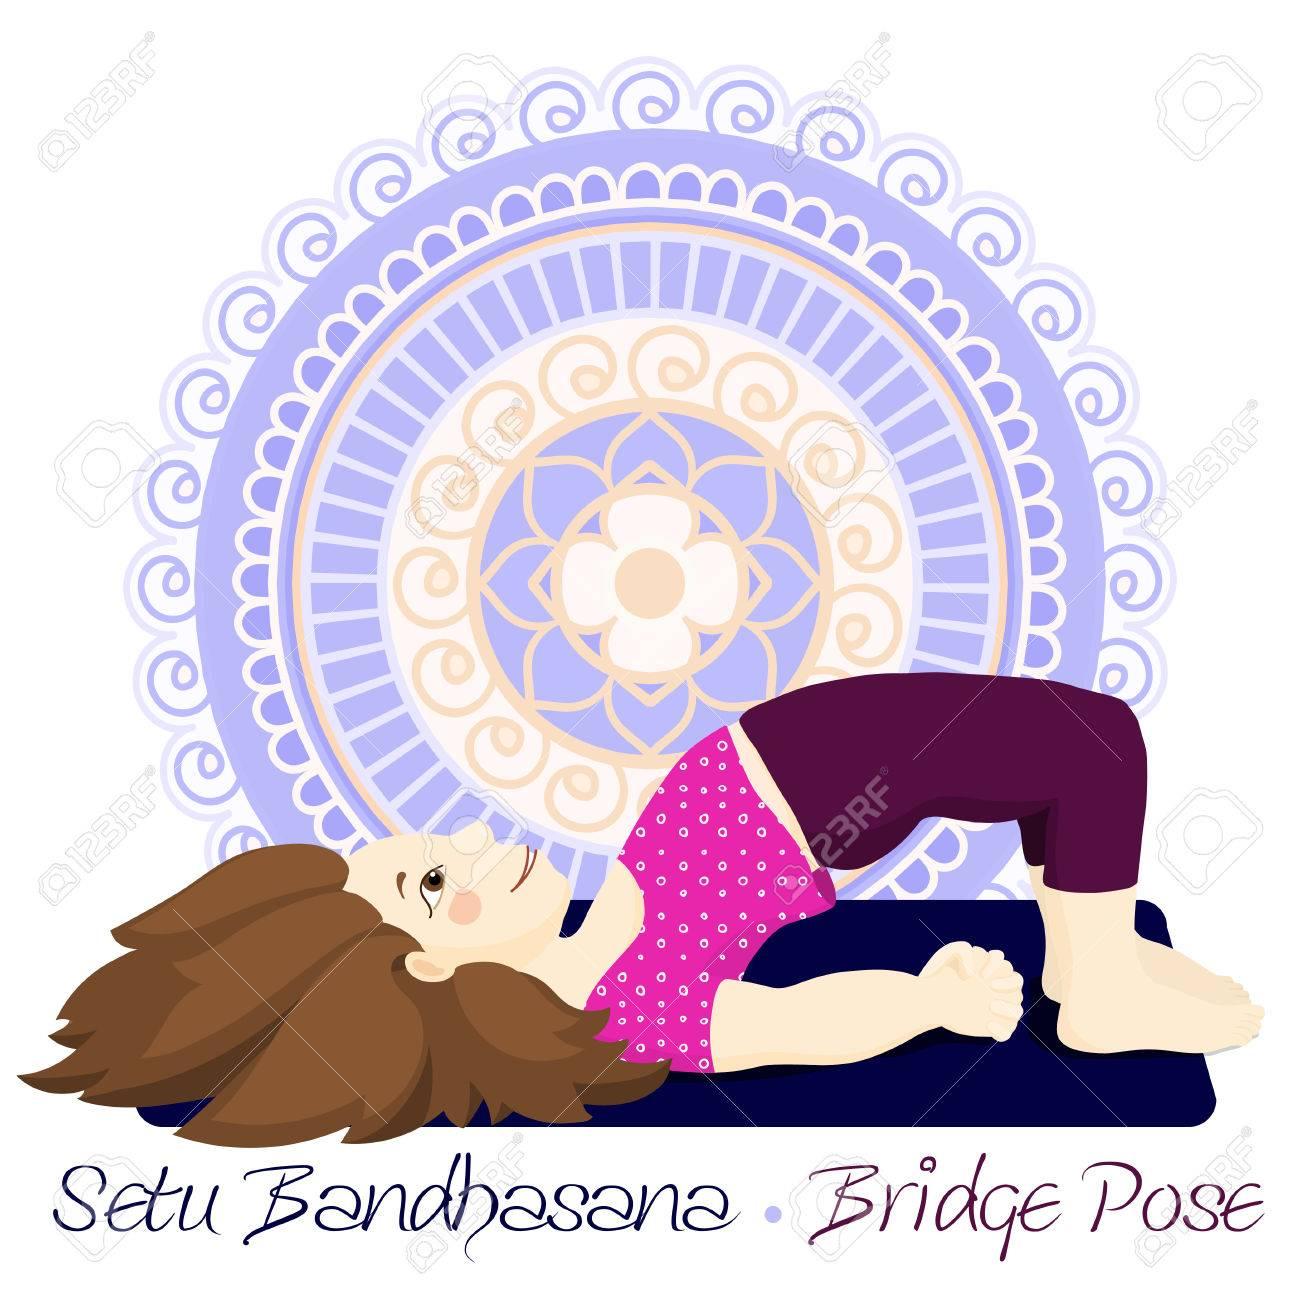 Cartoon Girl In Bridge Pose With Mandala Background Hand Draw